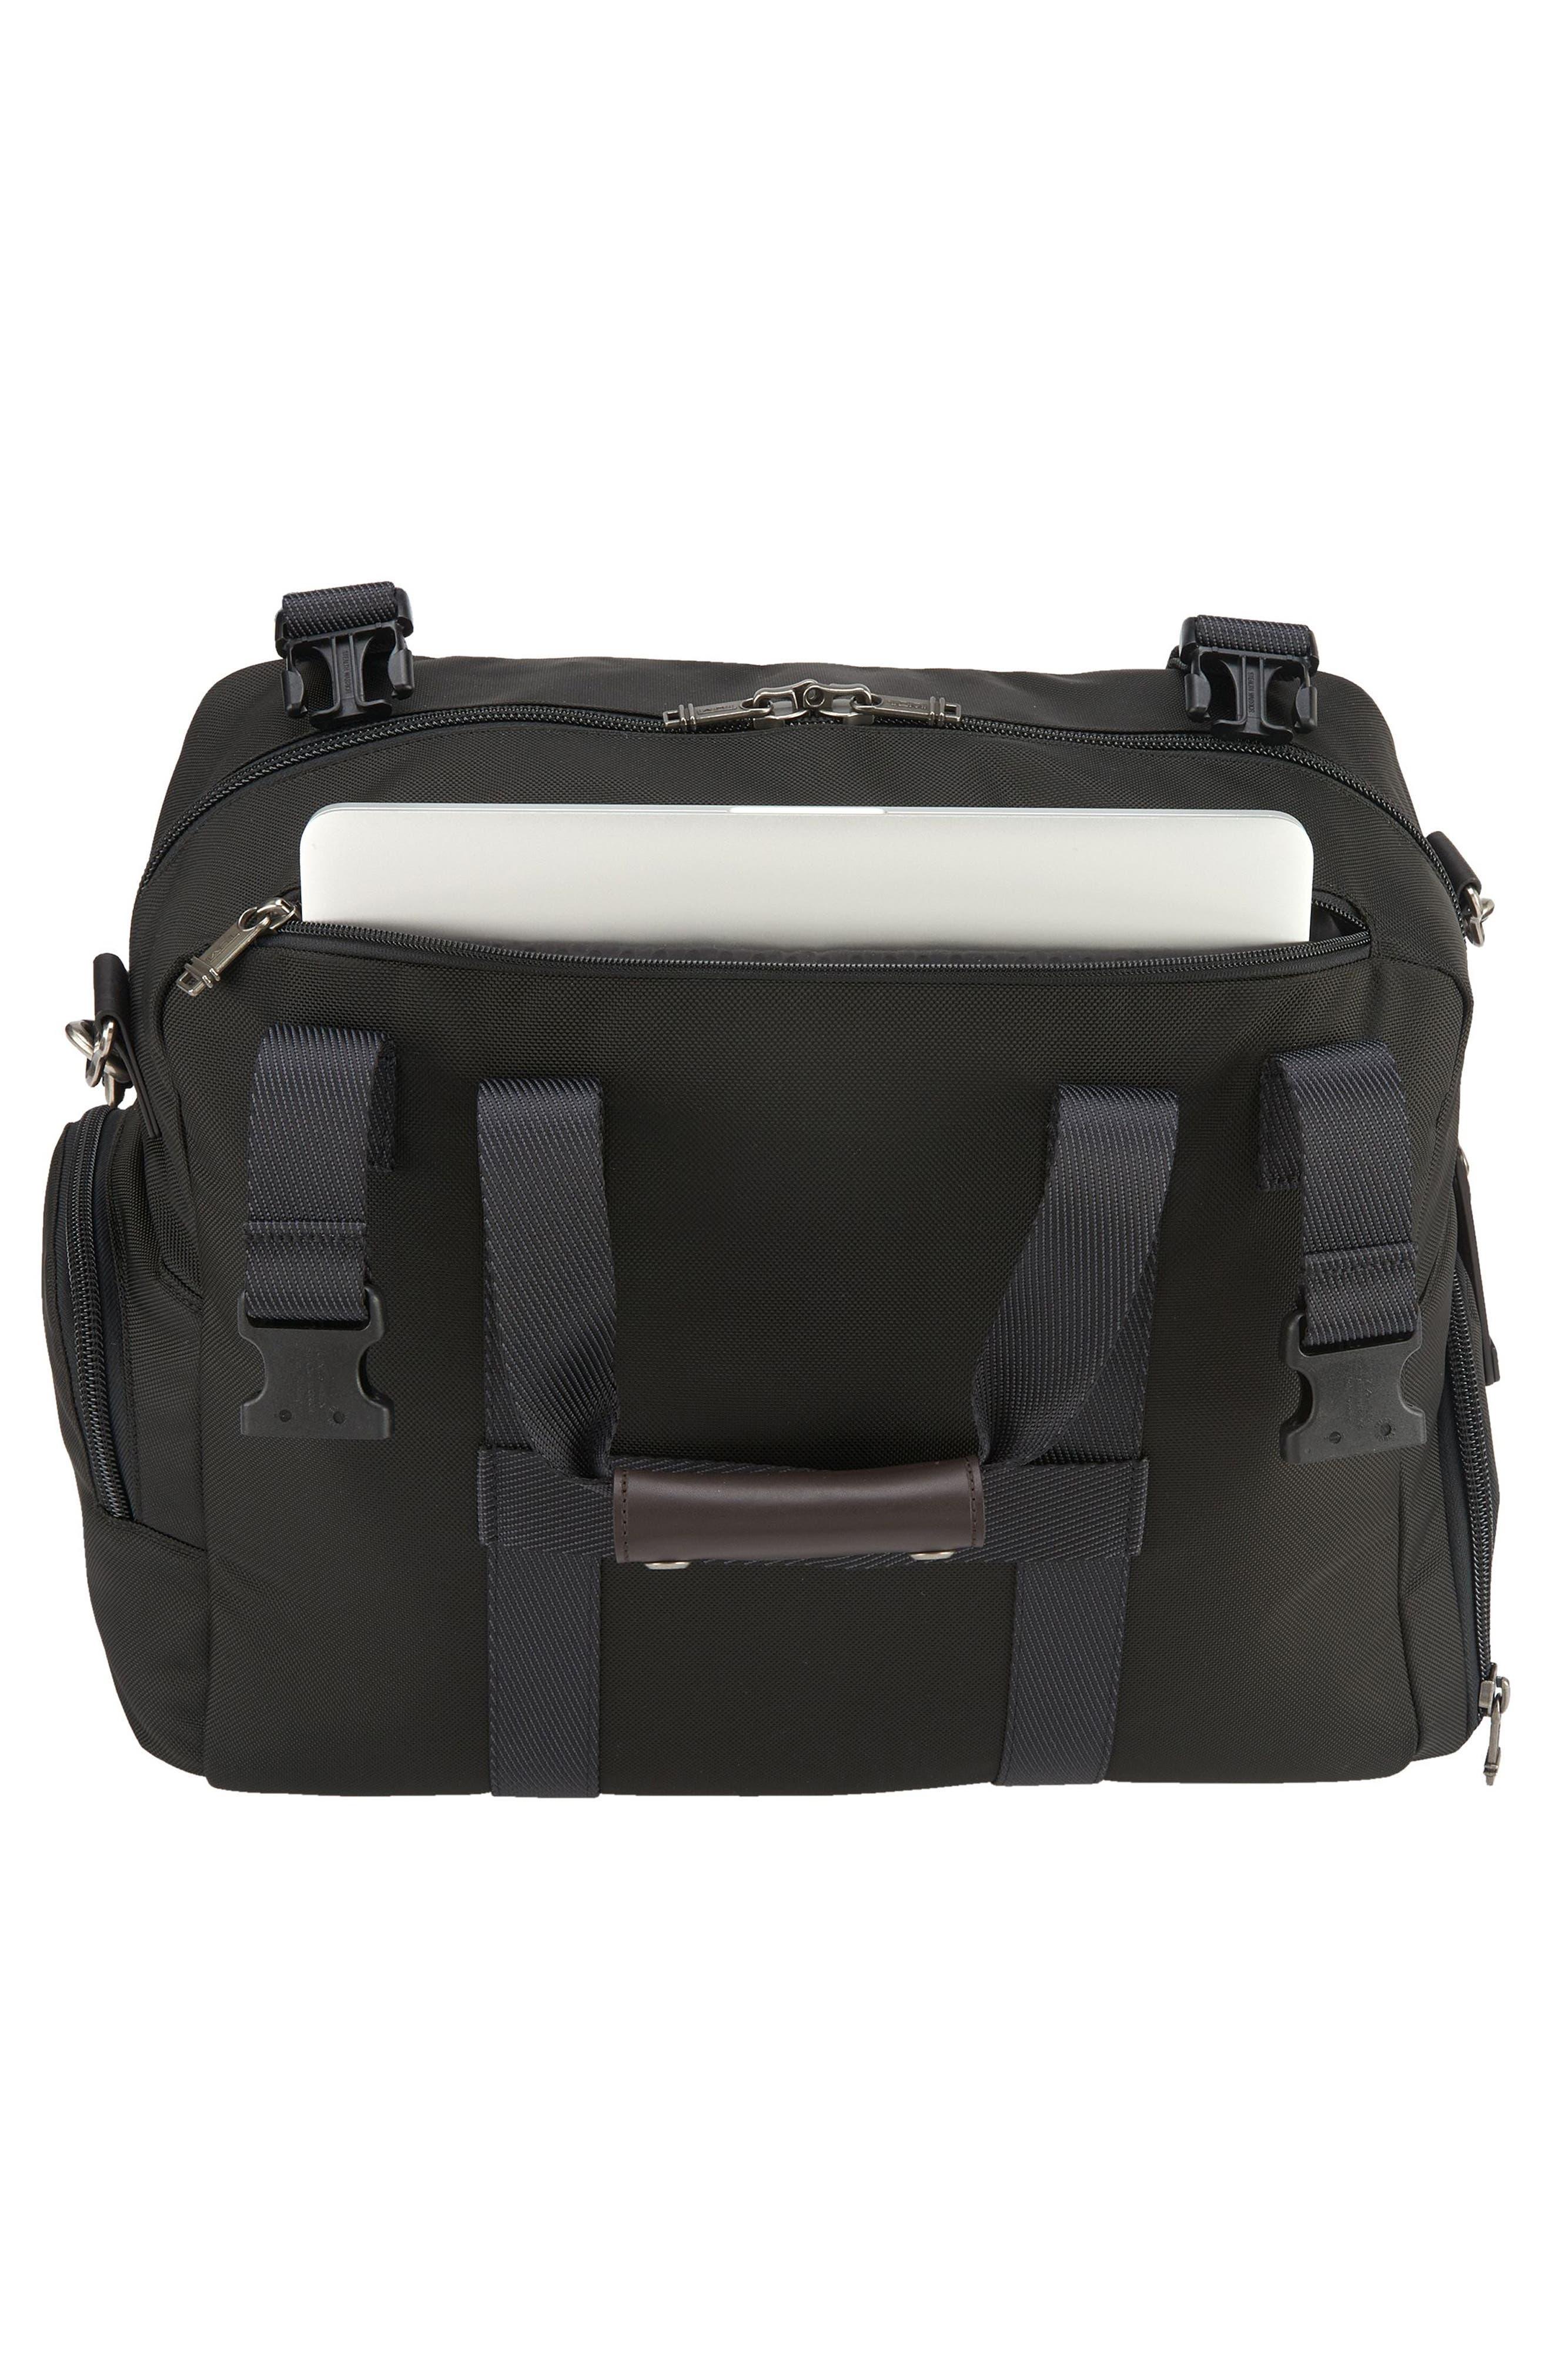 Alpha Bravo Buckner Duffel Bag,                             Alternate thumbnail 2, color,                             Hickory